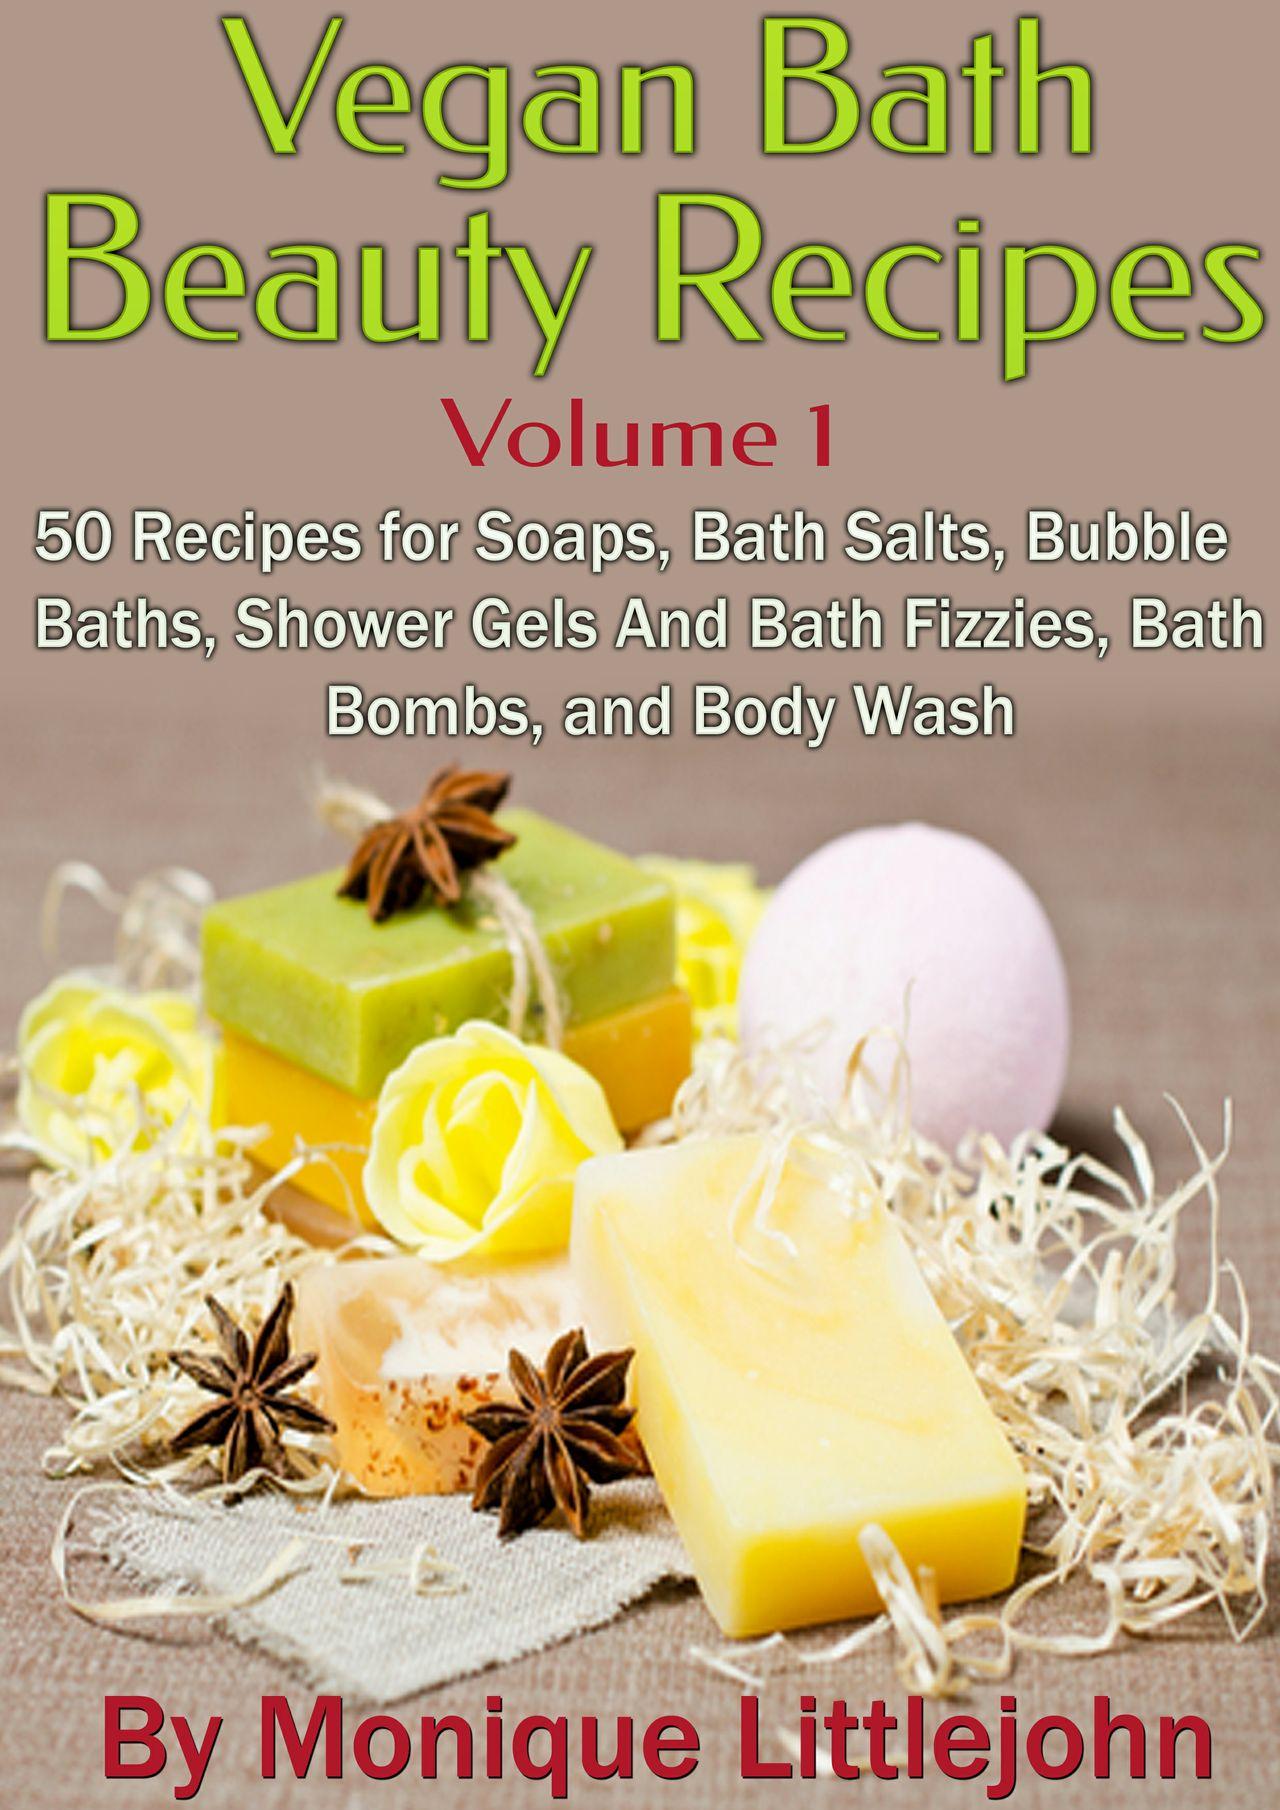 50 Vegan Bath and Beauty Recipes